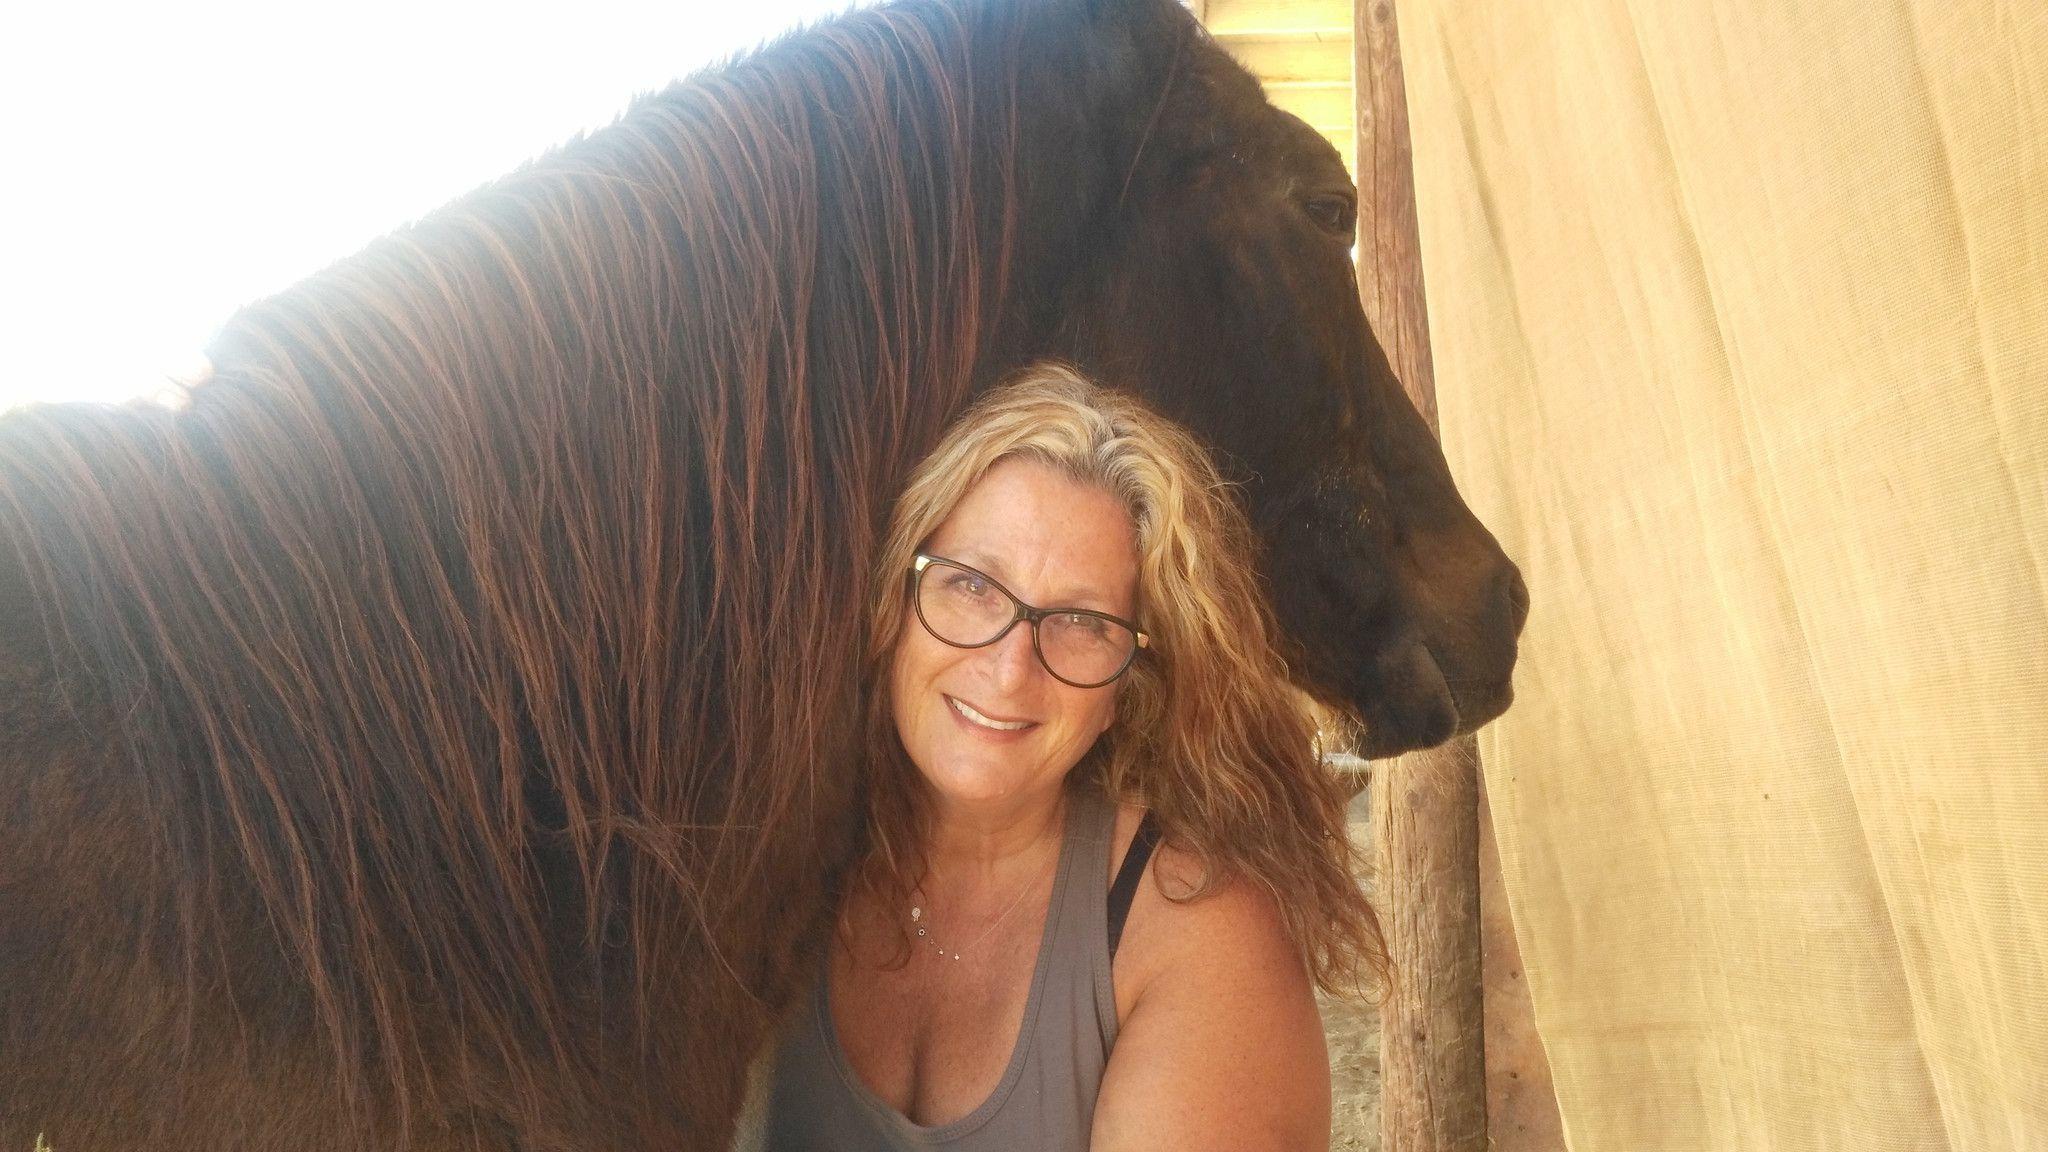 Victory nuzzles Ilana Friedman, who runs the 2 The Rescue Animal Sanctuary nonprofit.